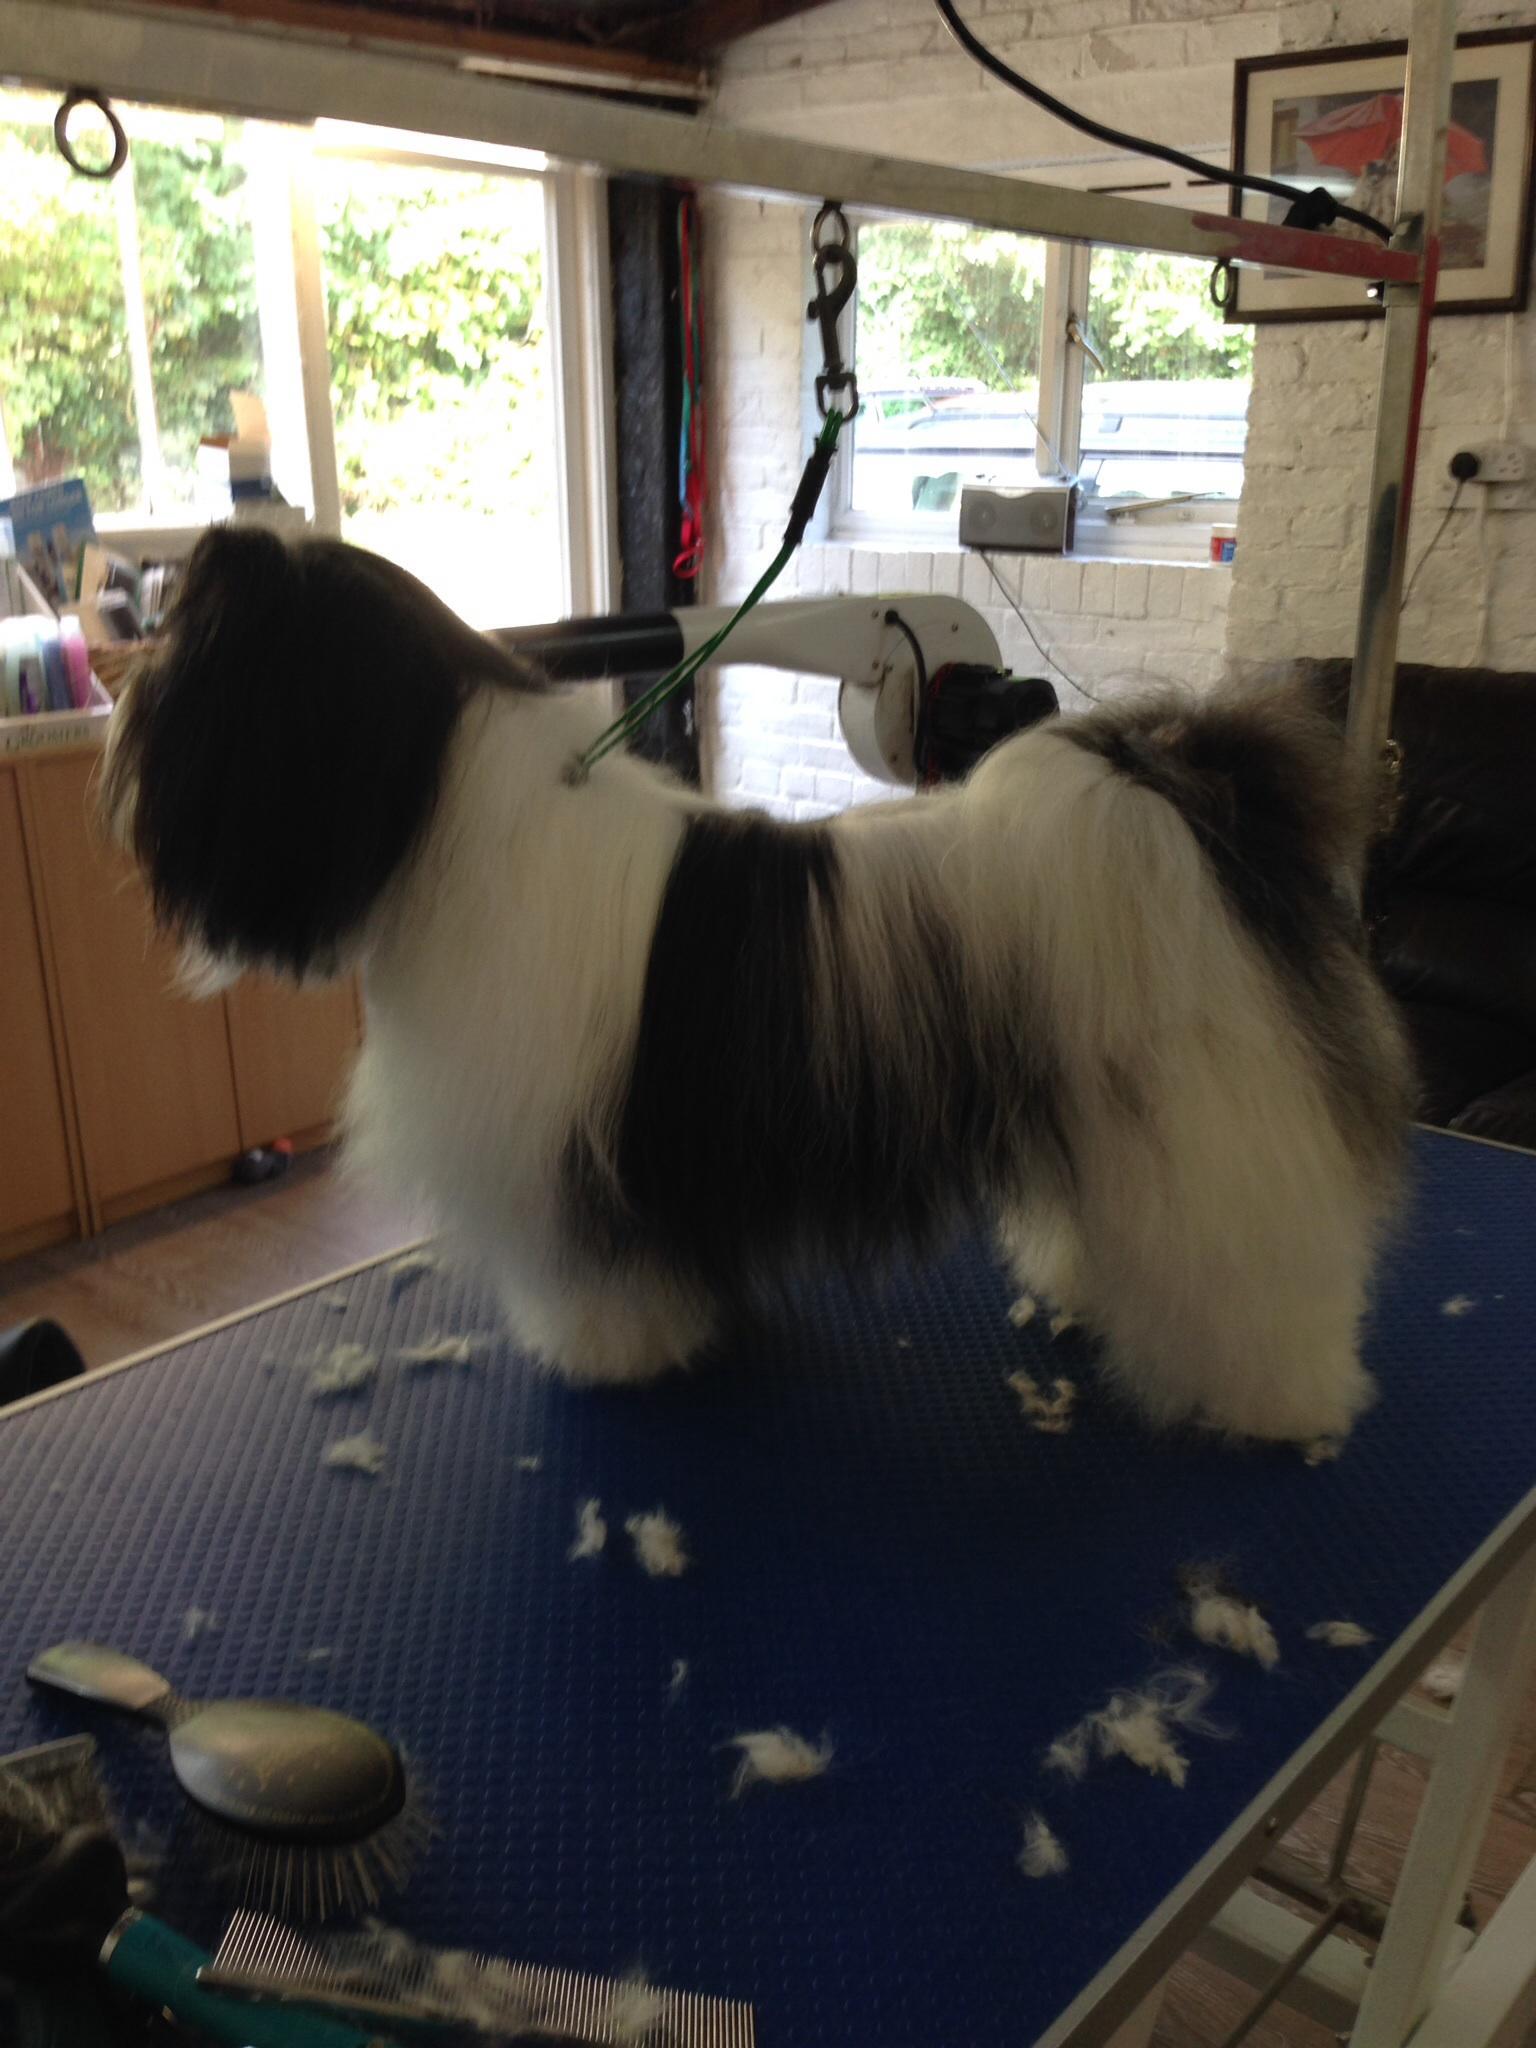 Devizes Dog Grooming By Marianne - MELKSHAM, Wiltshire SN12 6RT - 01380 827235 | ShowMeLocal.com